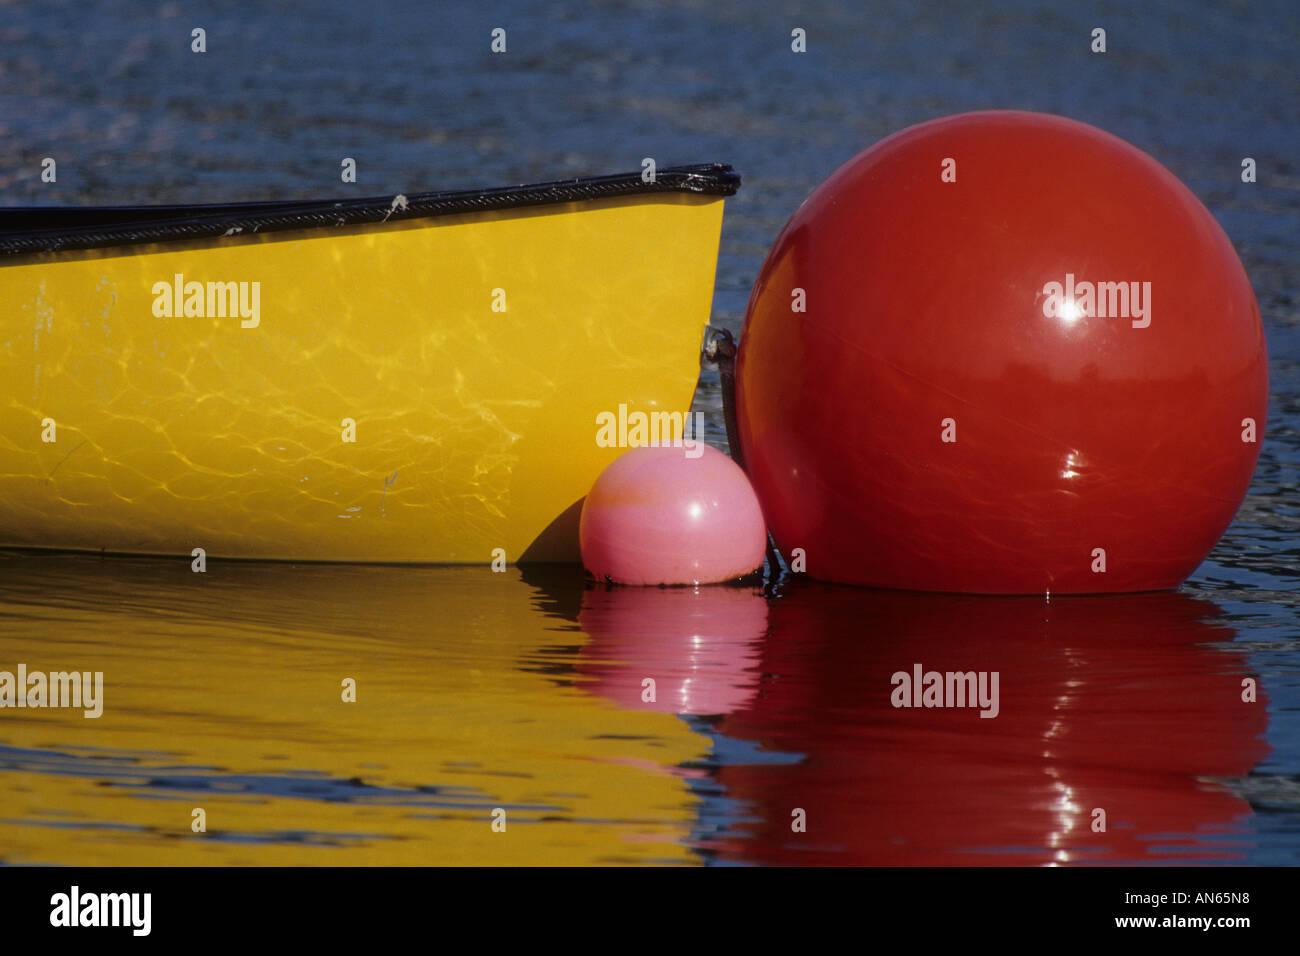 Maine USA Boje Boot Hafen Farben Wasser rot blau gelb Buoy boat ...